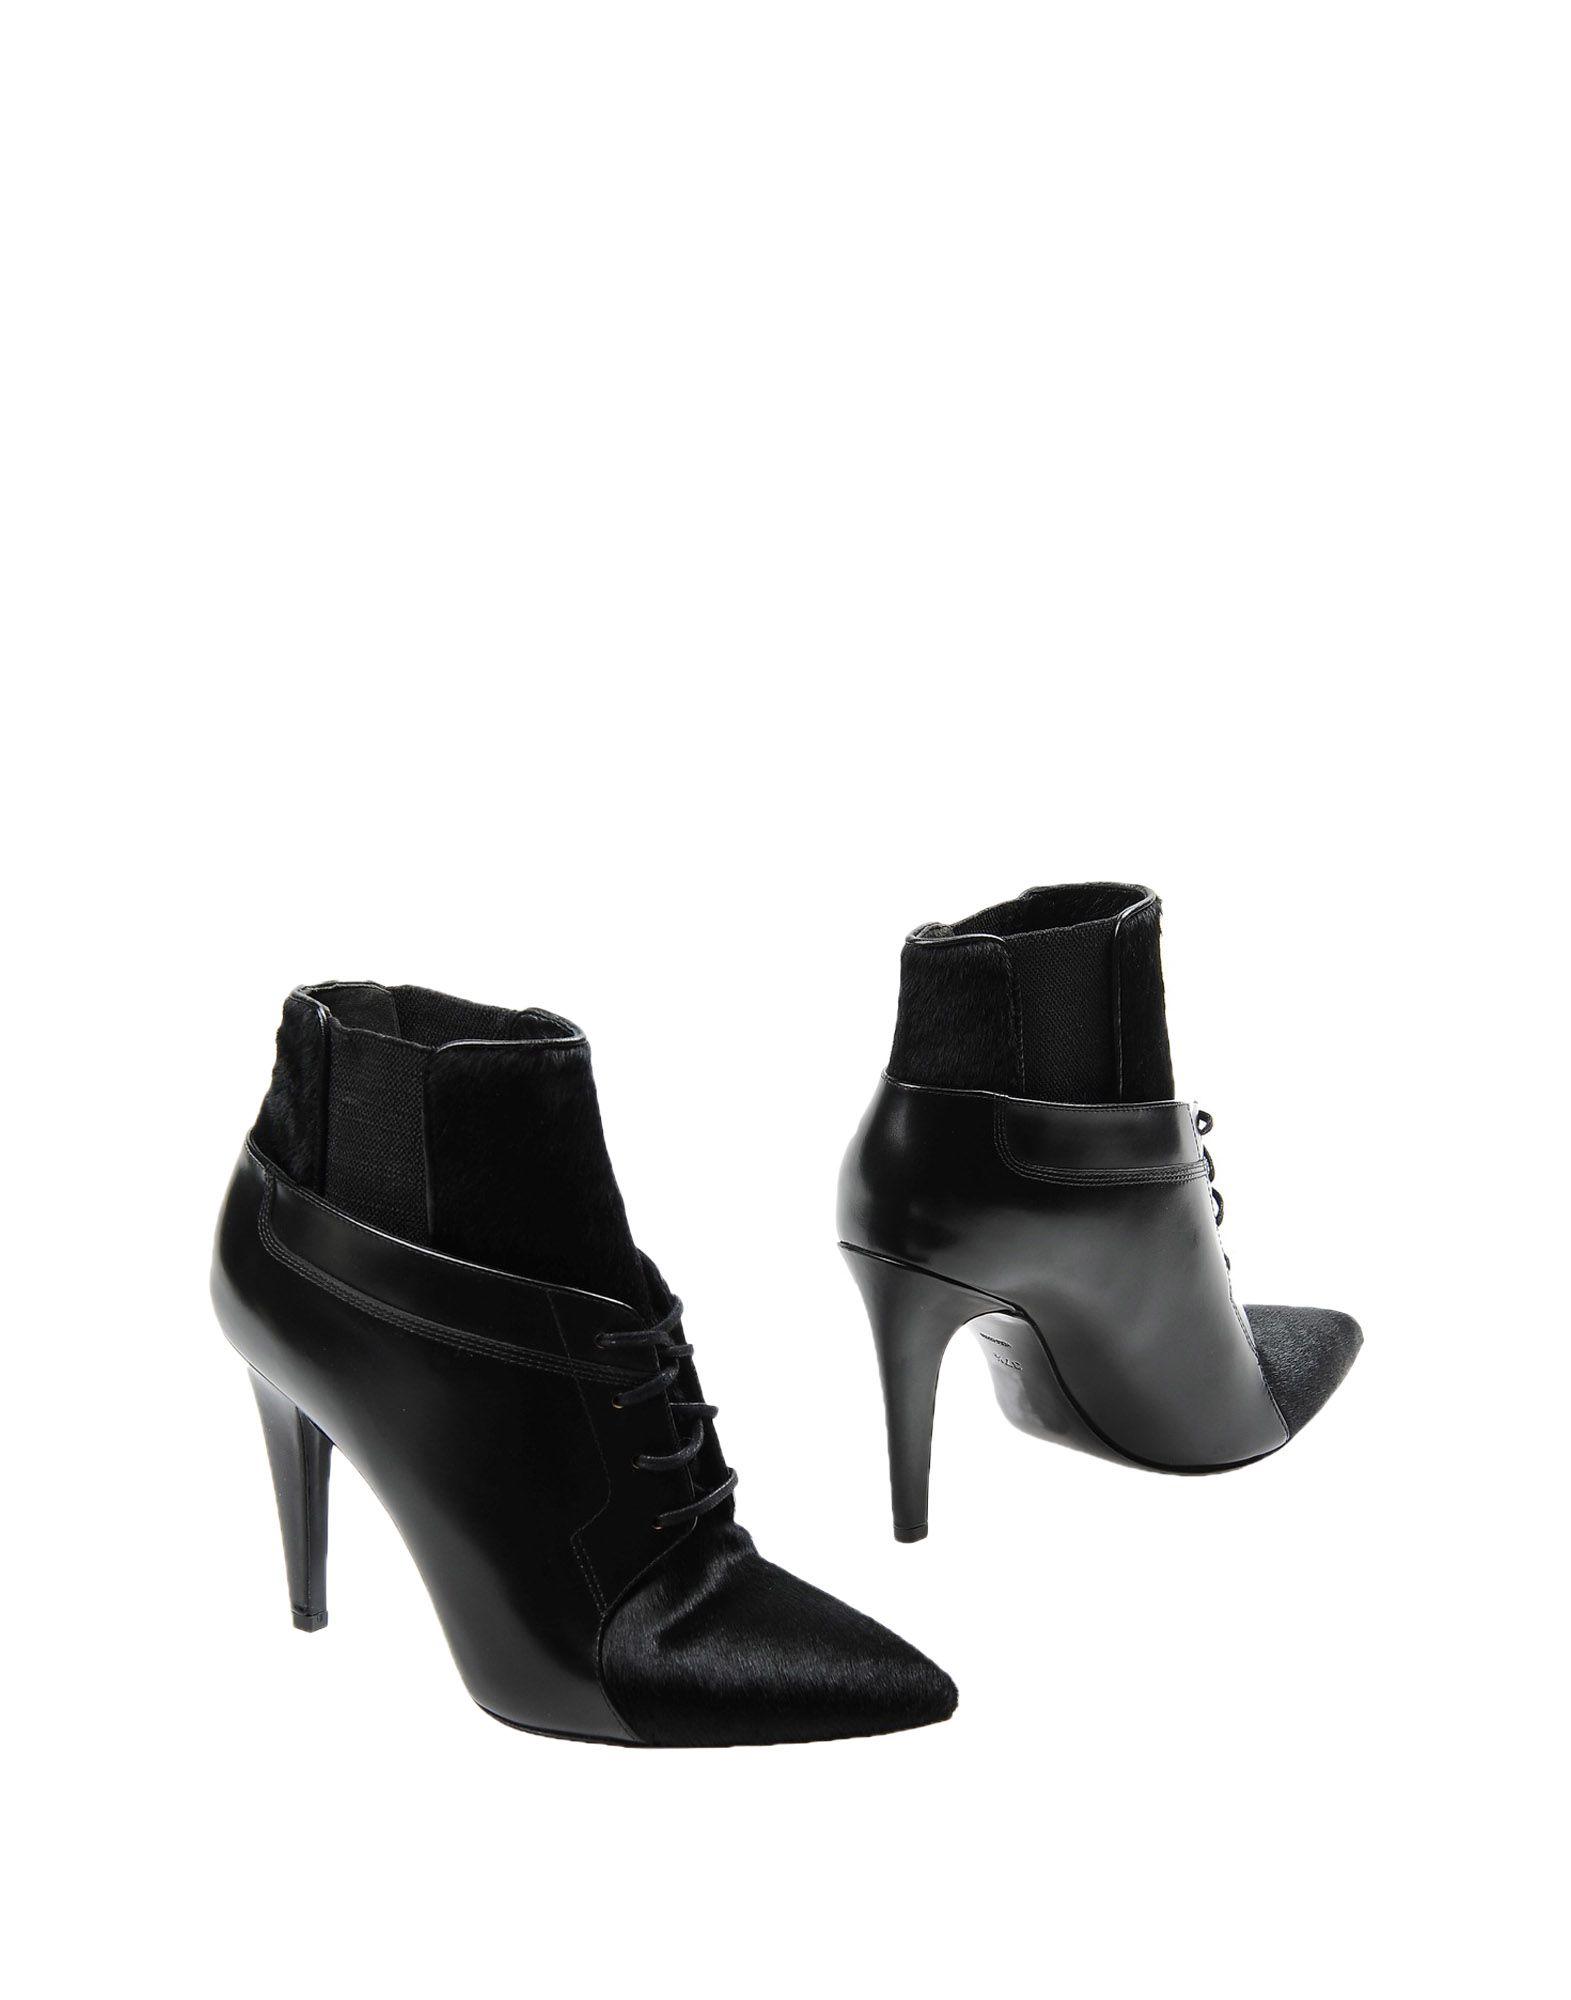 Alexander Wang Stiefelette Damen  11066489HQGut aussehende strapazierfähige Schuhe